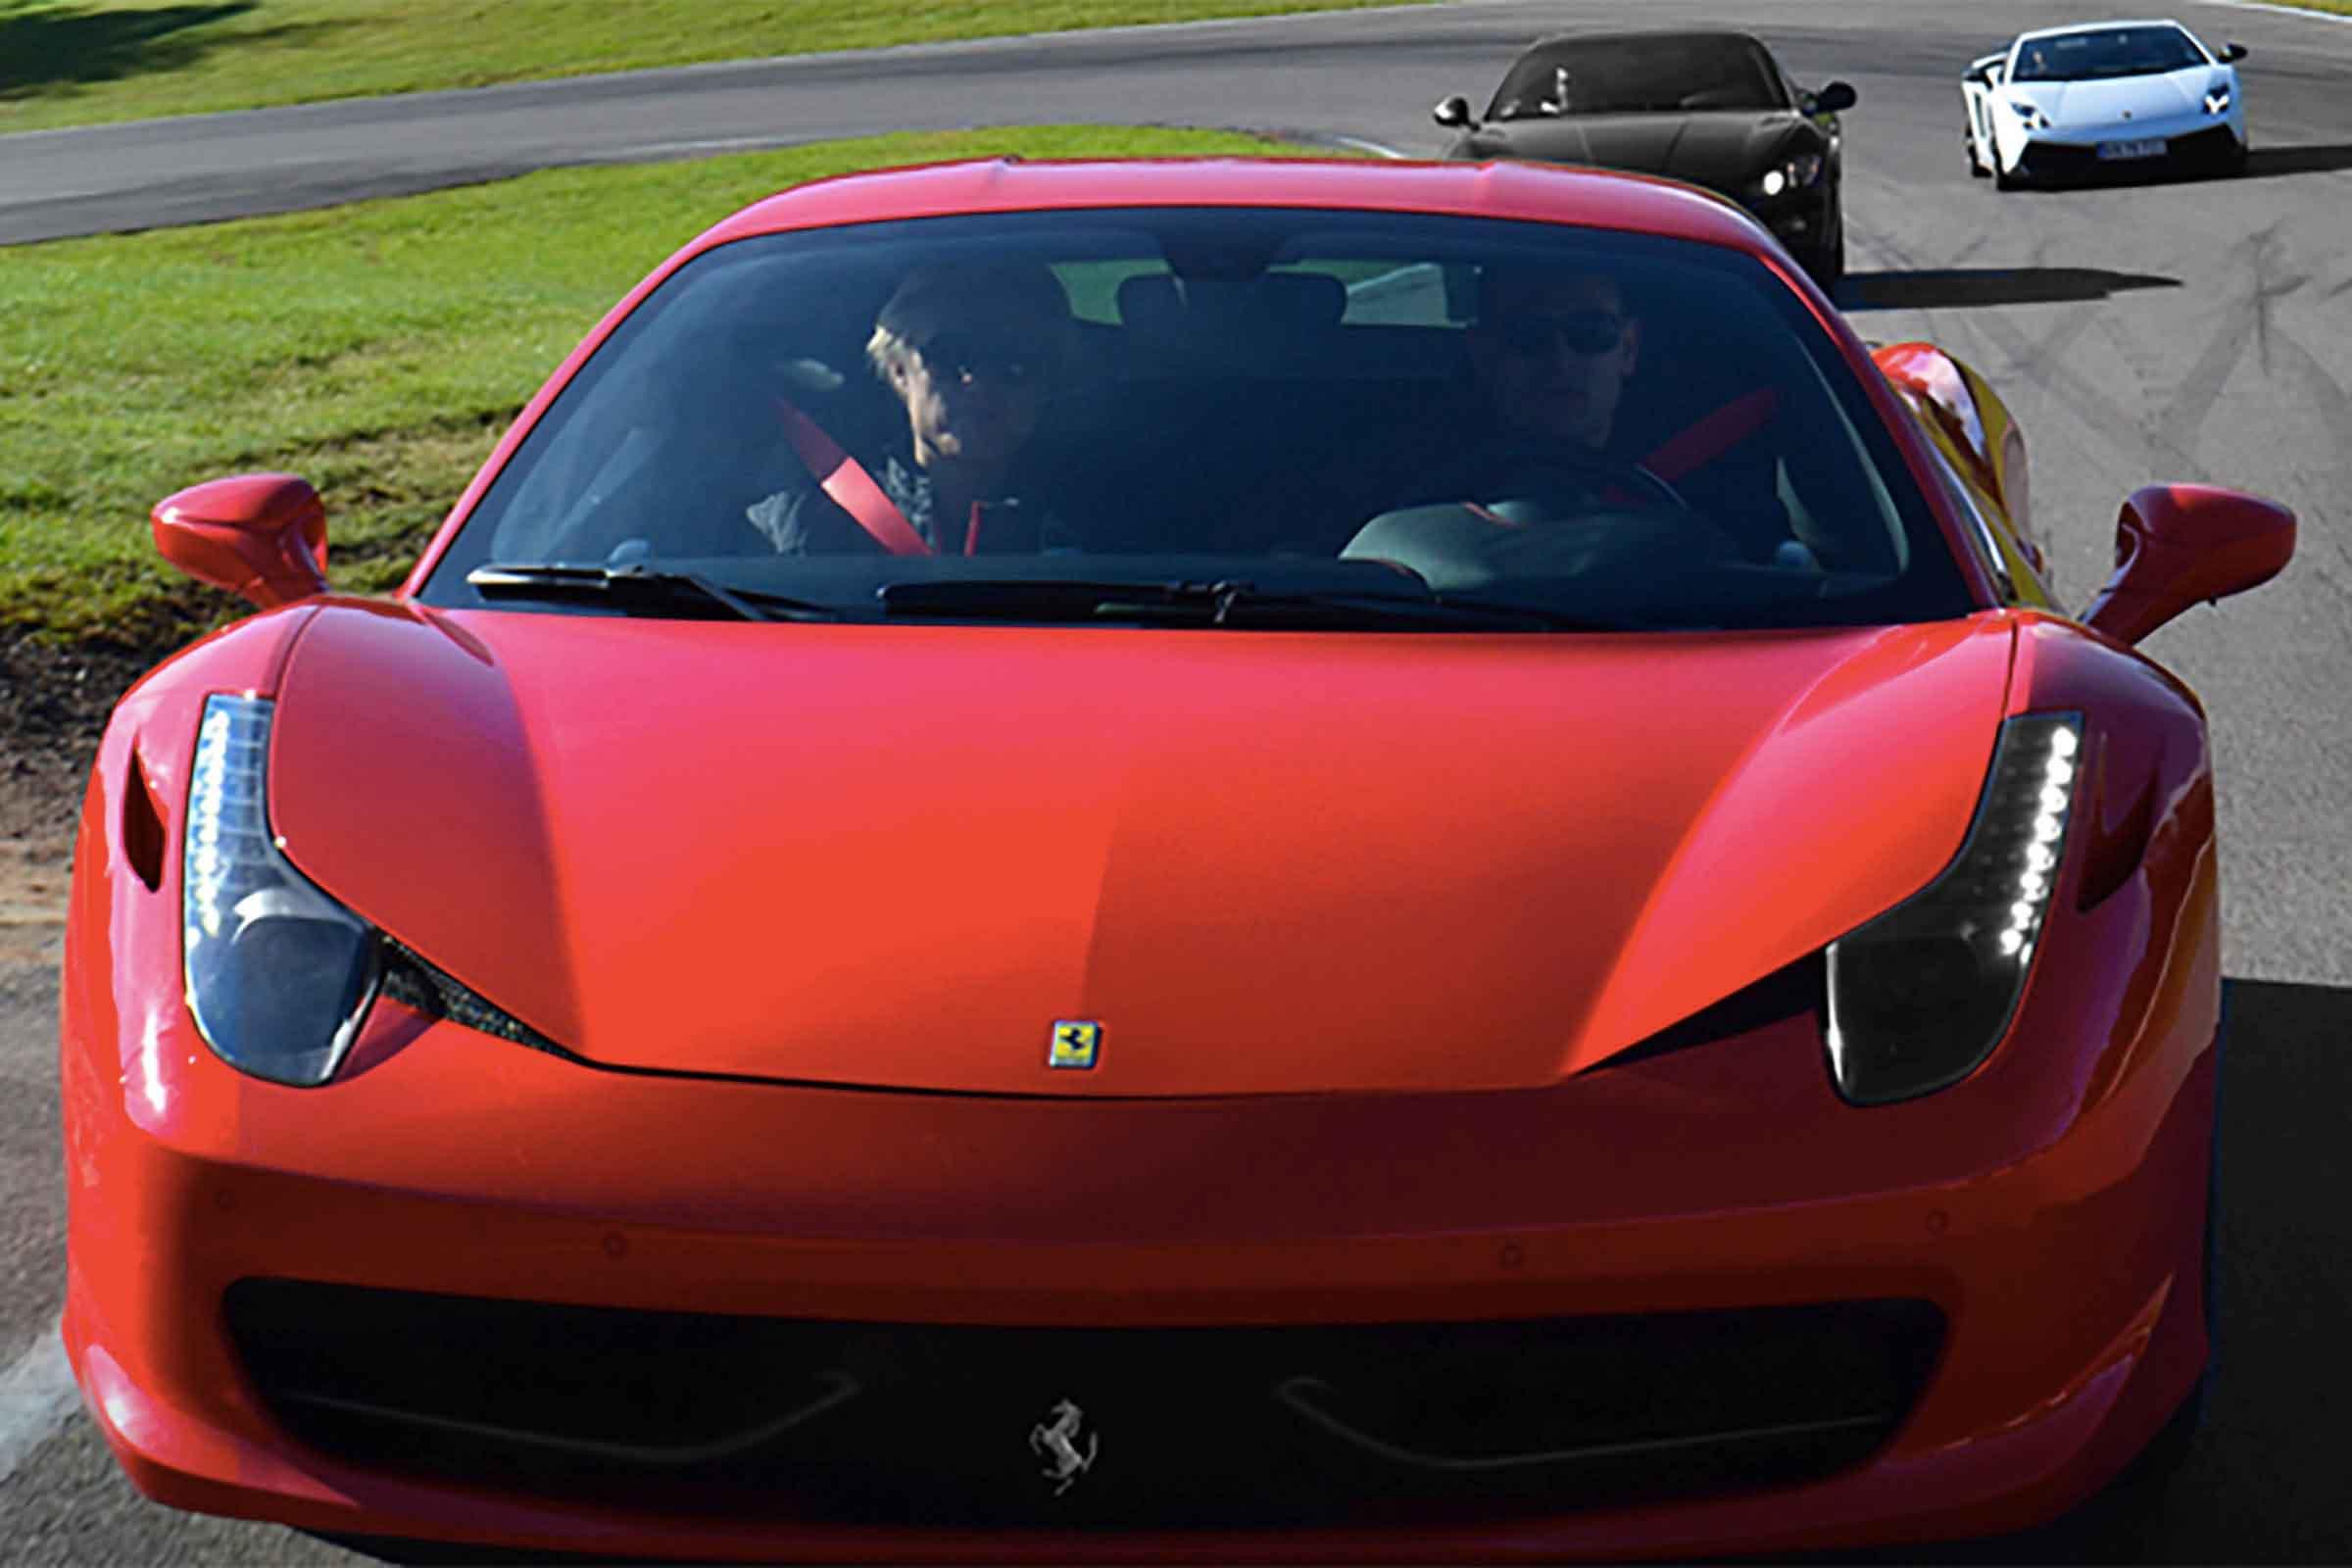 Kör Supersportbil på Racingbana